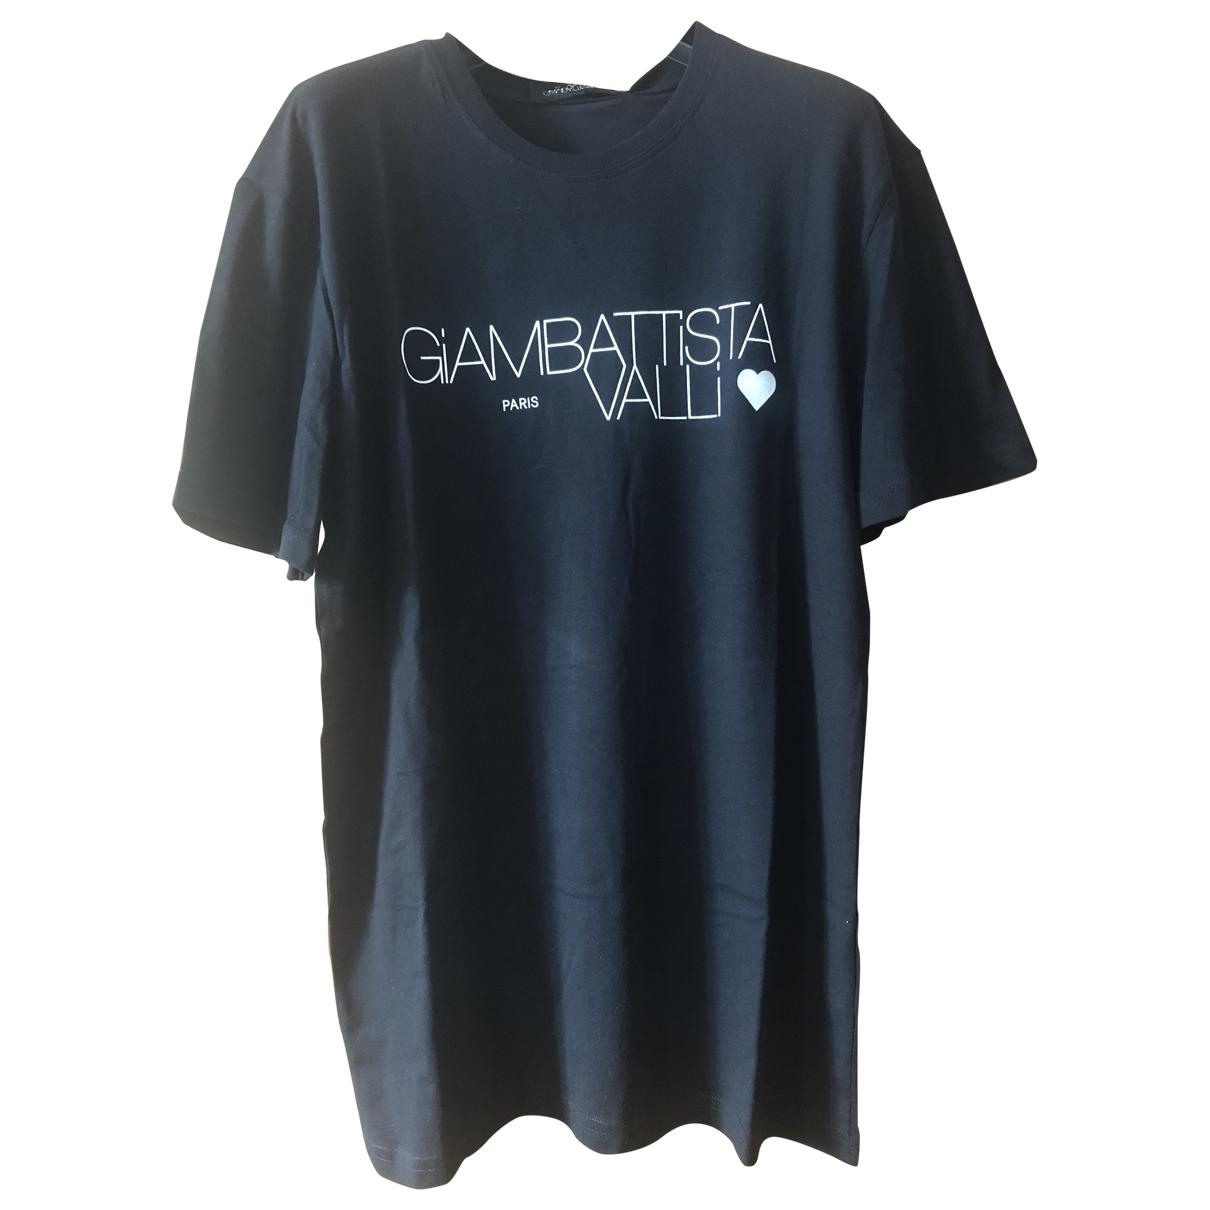 Giambattista Valli X H&m \N Black Cotton T-shirts for Men S International